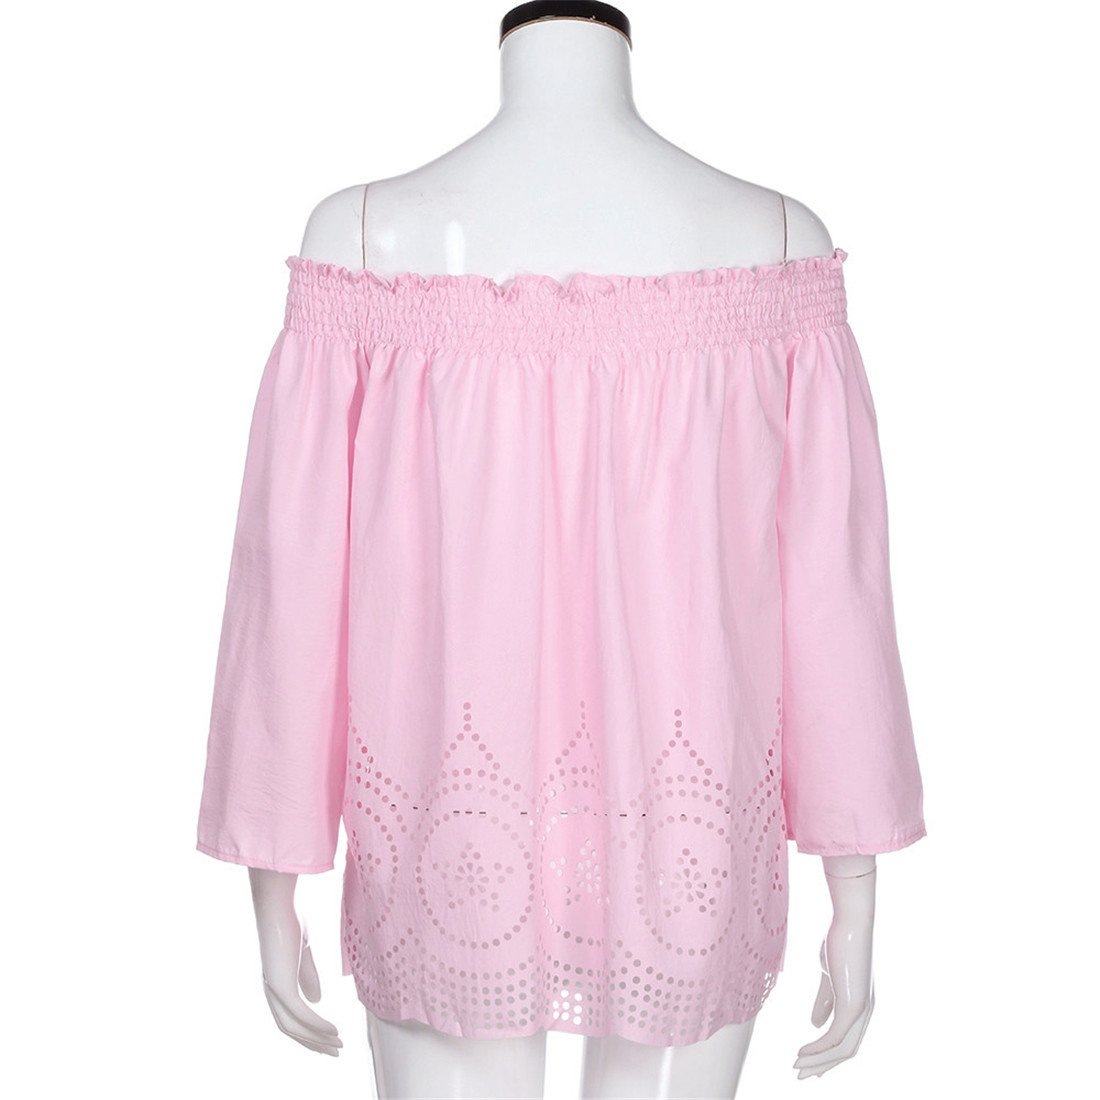 66f2e17de Womens Long Sleeve Tops